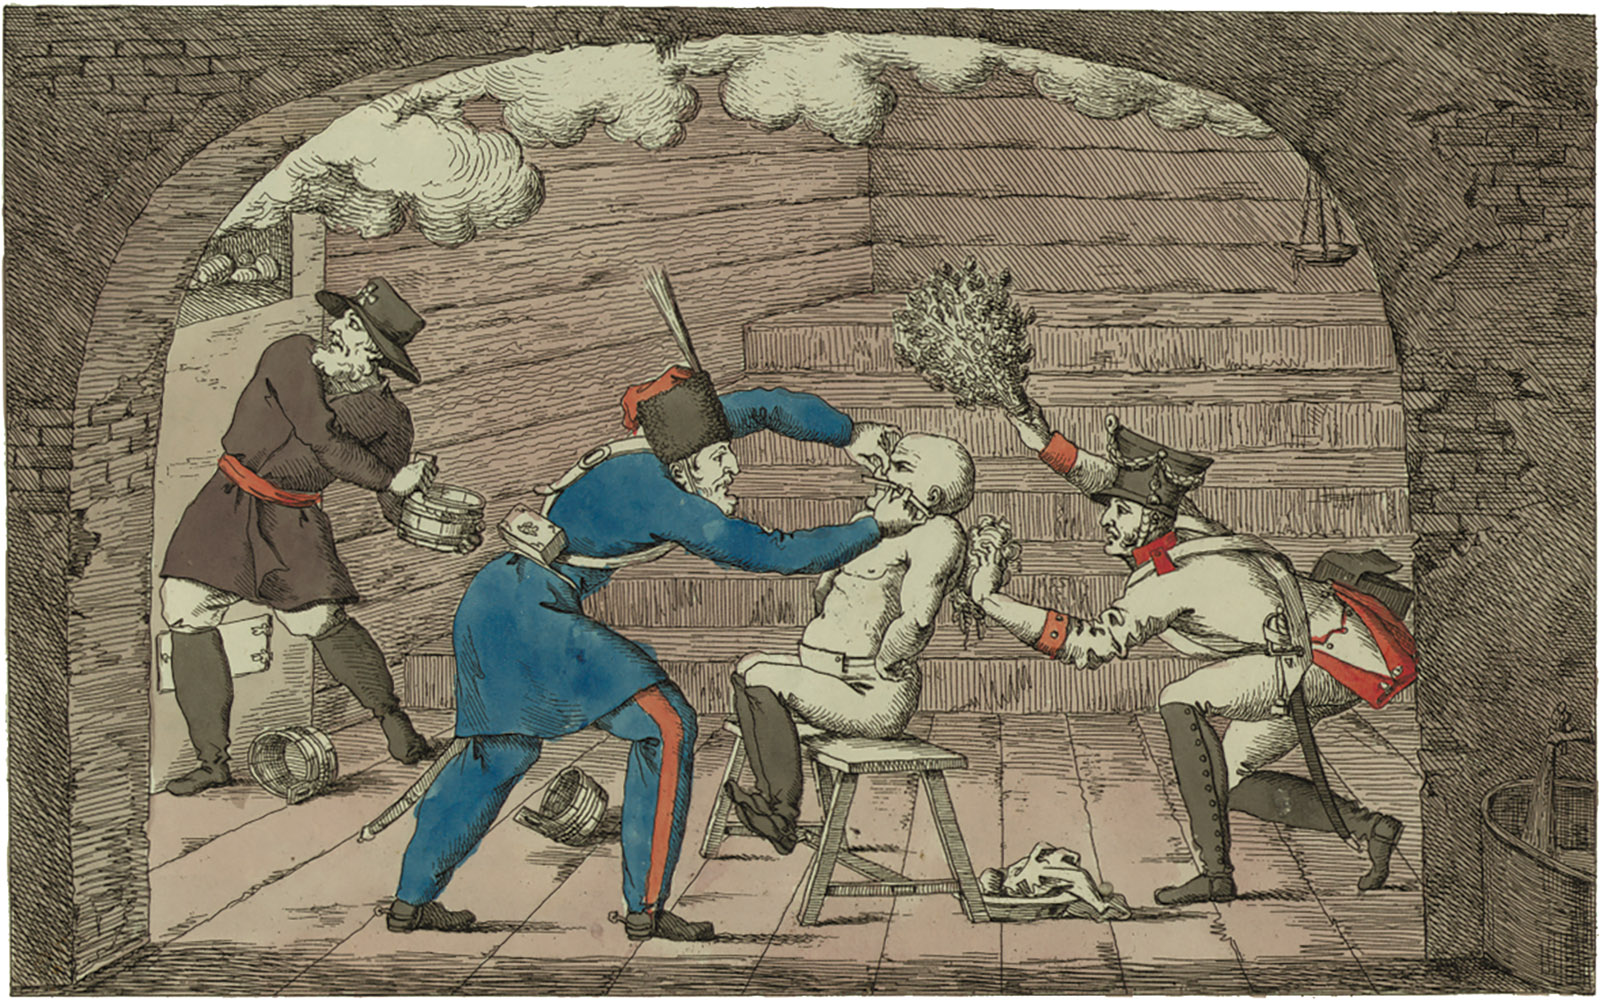 Napoleon being beaten in a banya; illustration by Ivan Terebenev